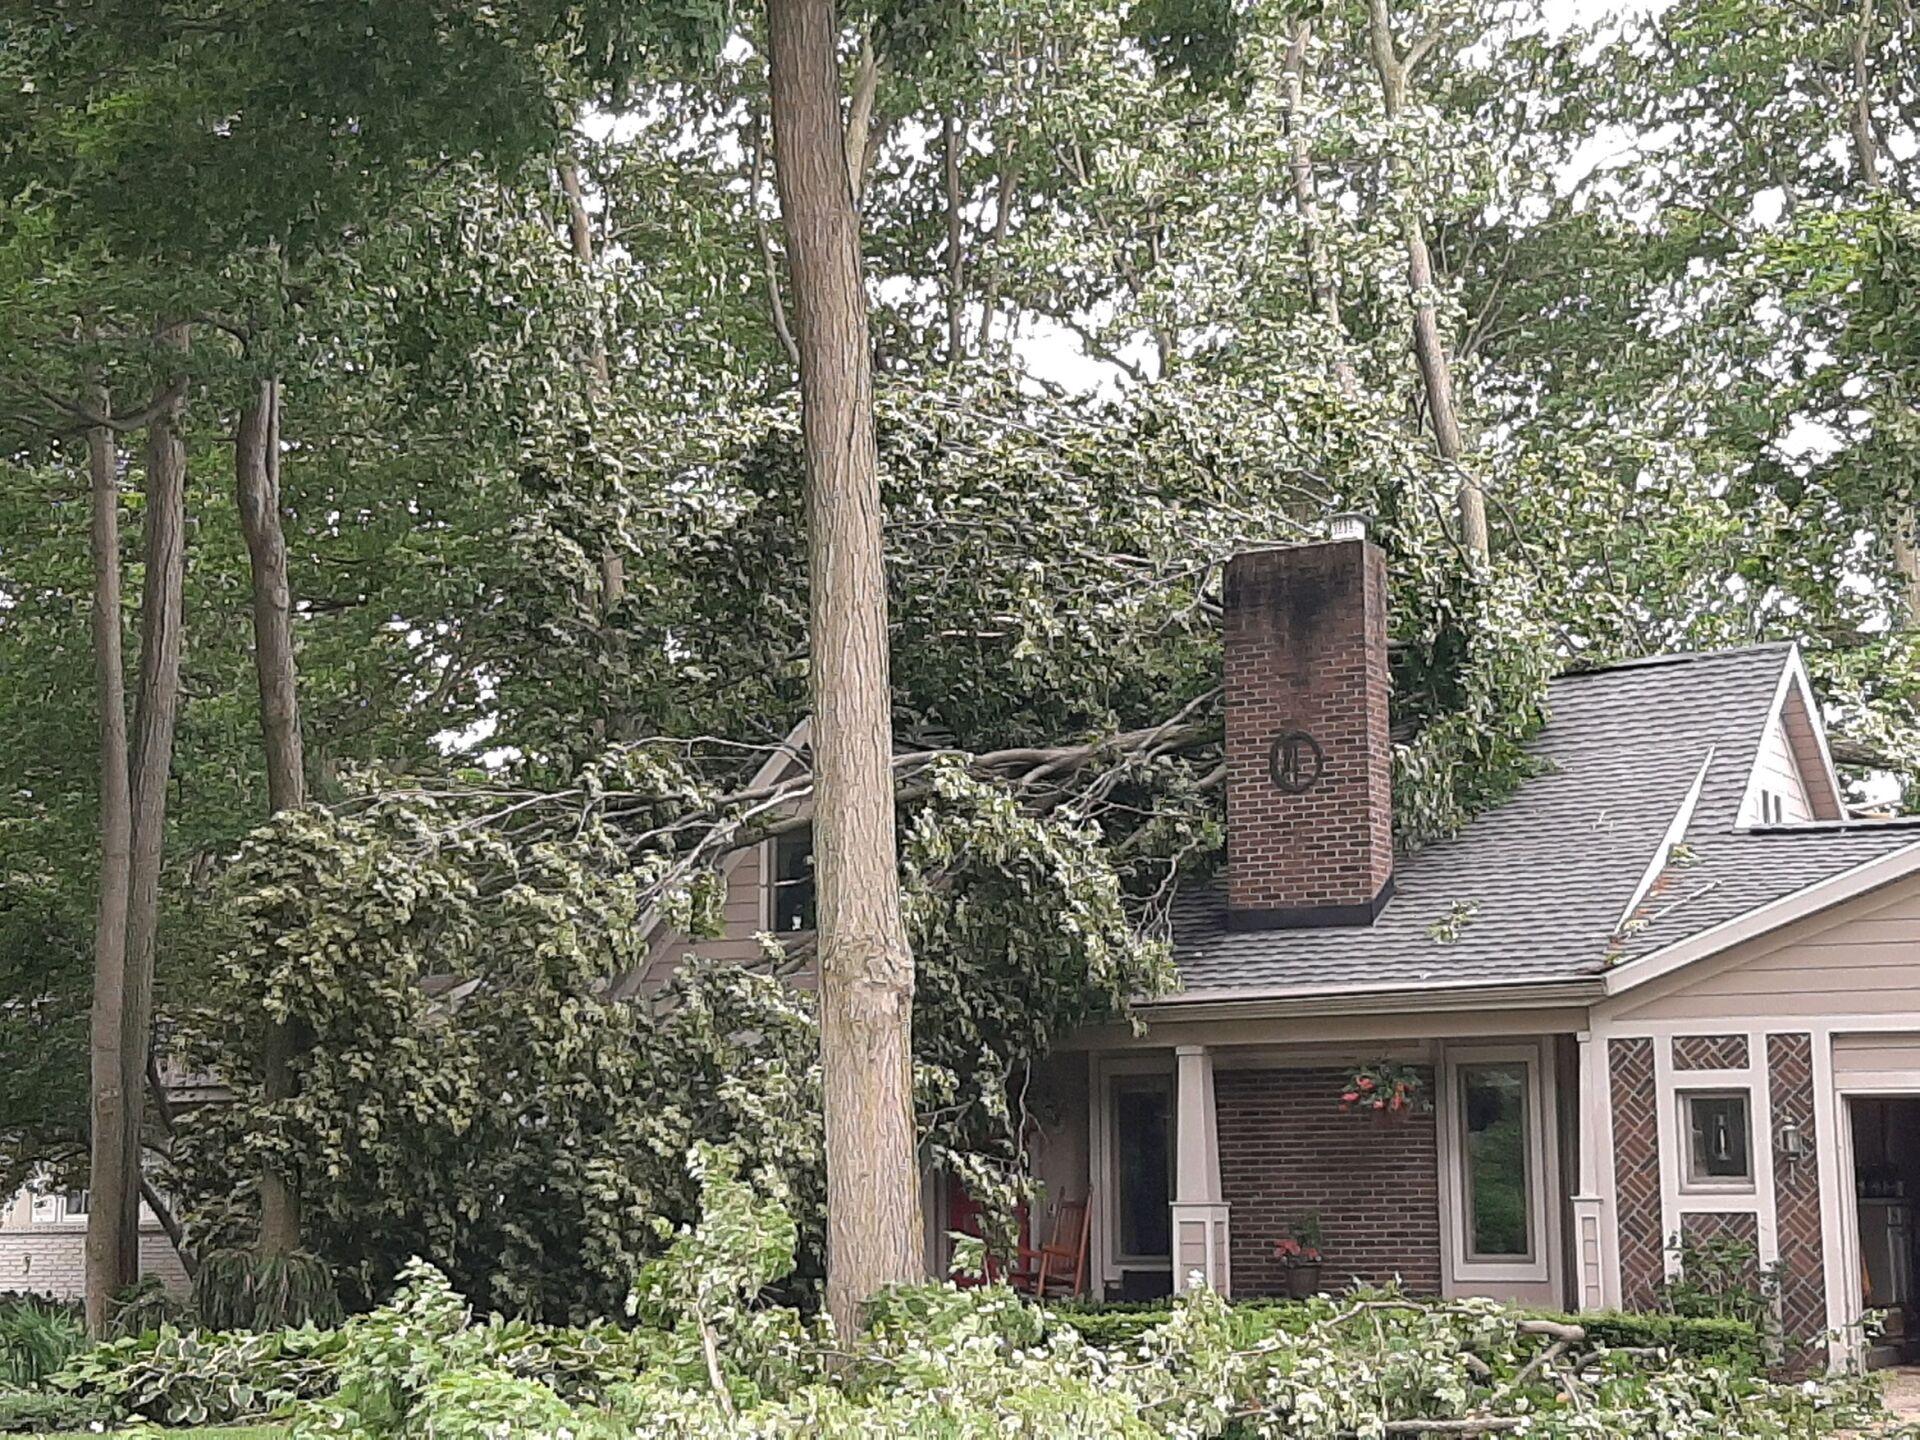 Gerogetown township storm damage 6.jpg